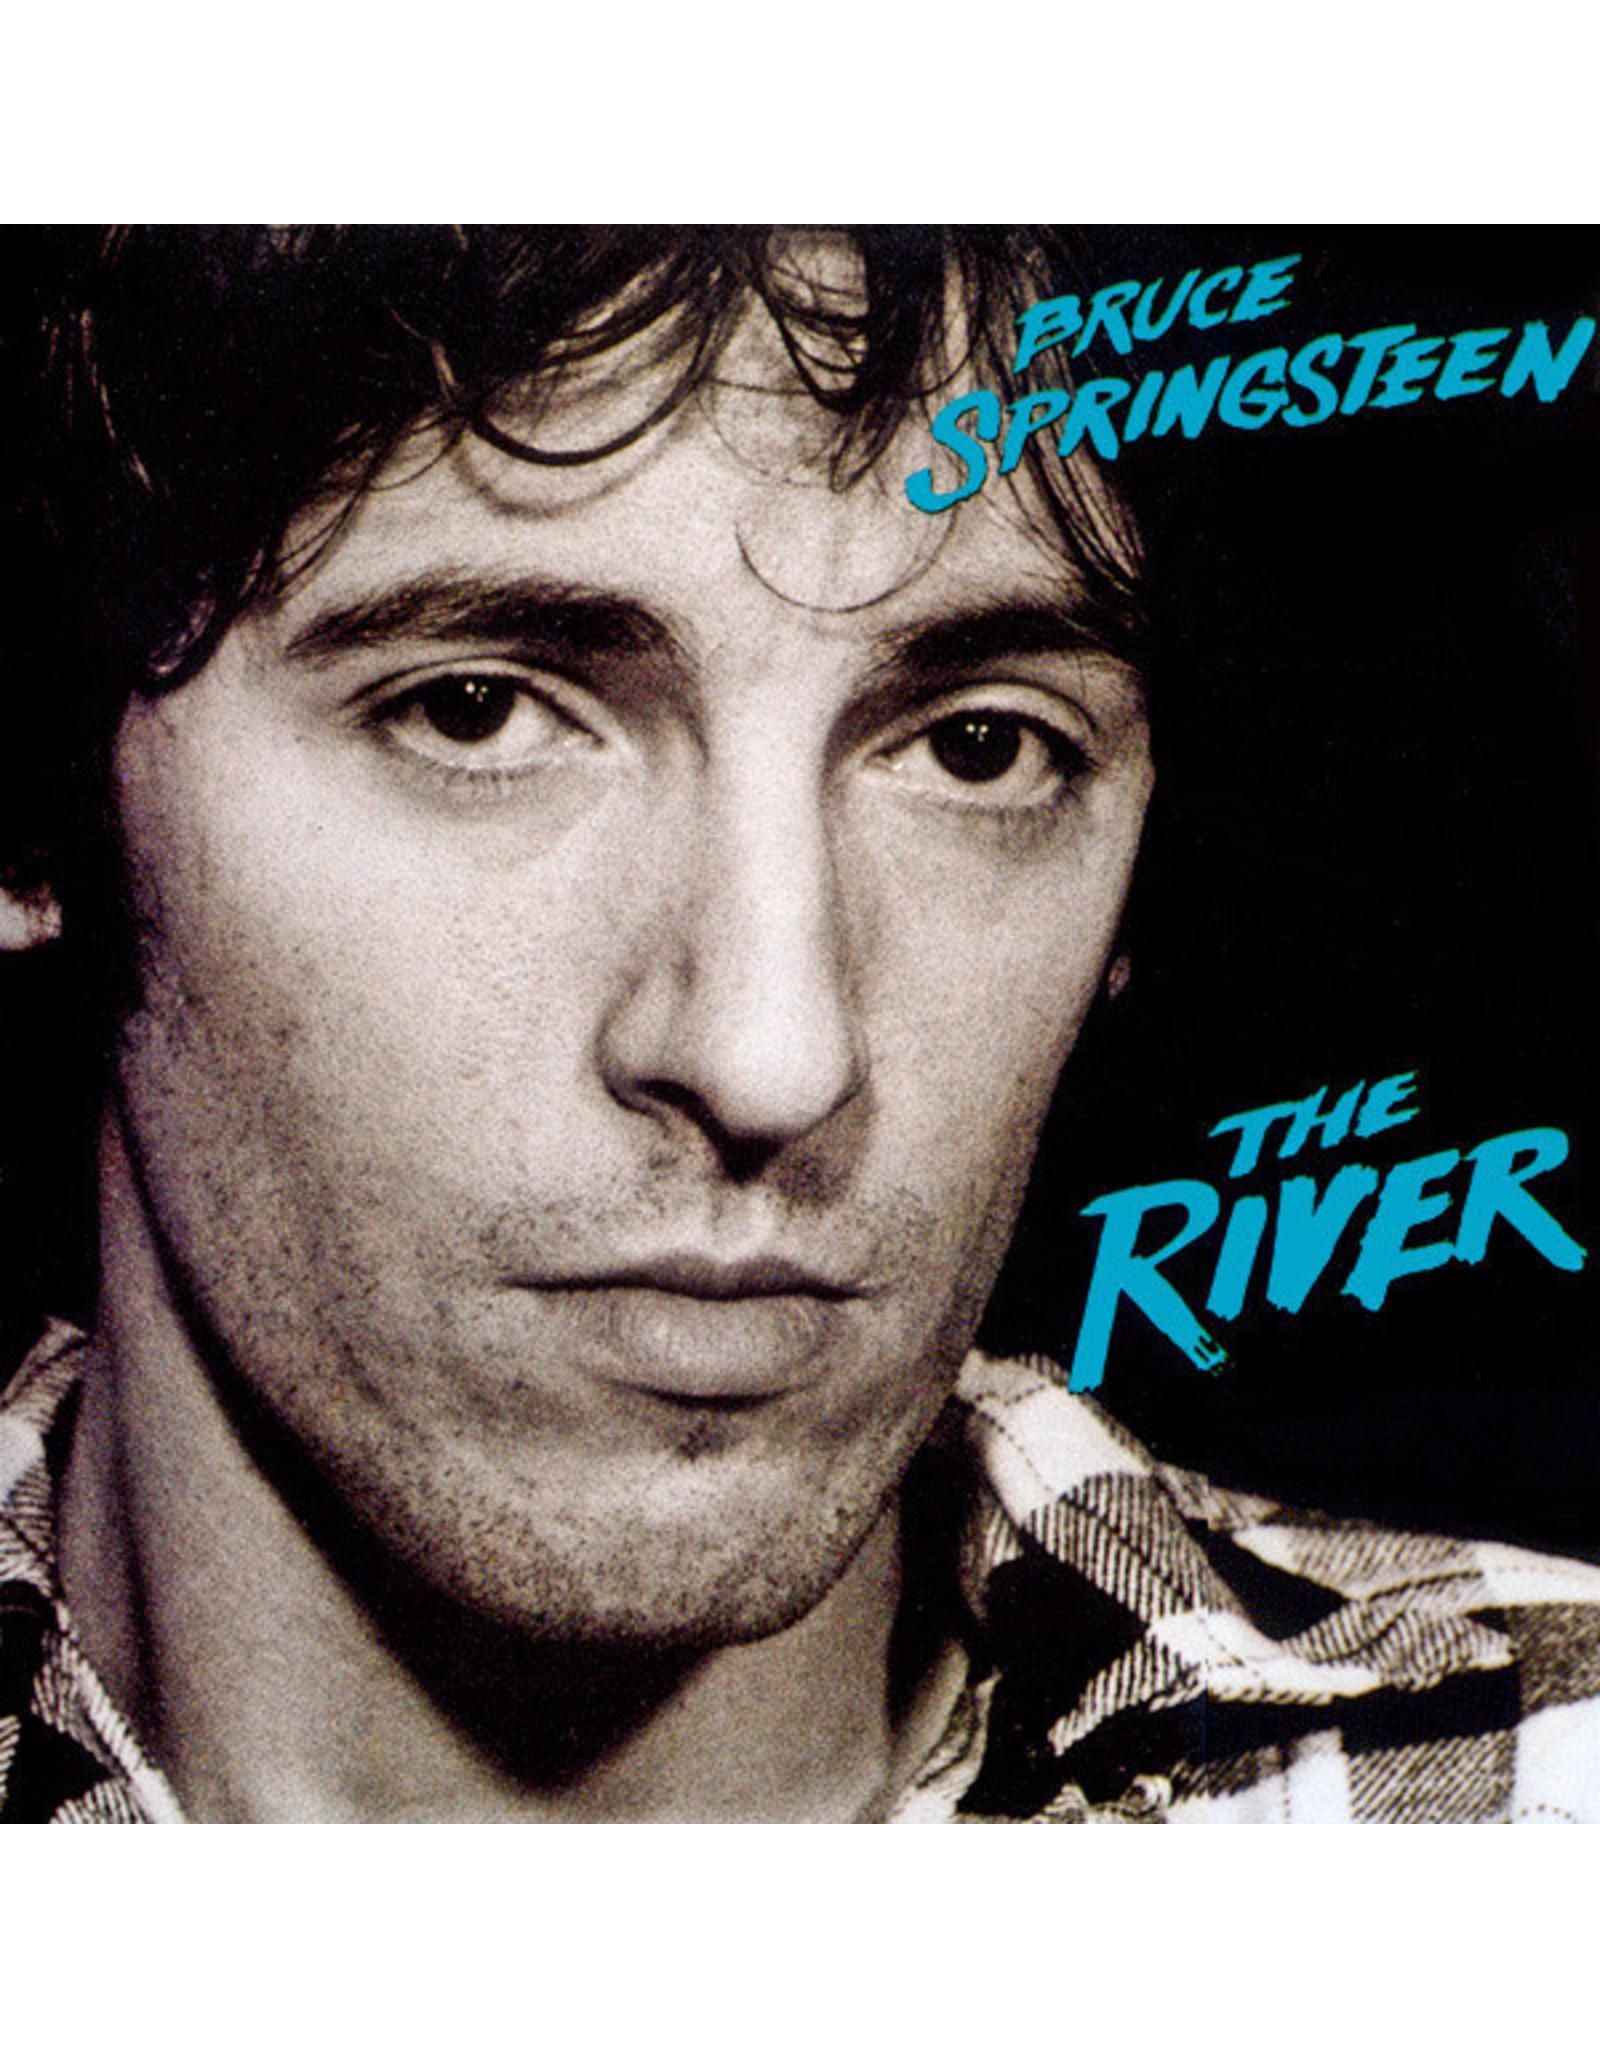 Bruce Springsteen - River